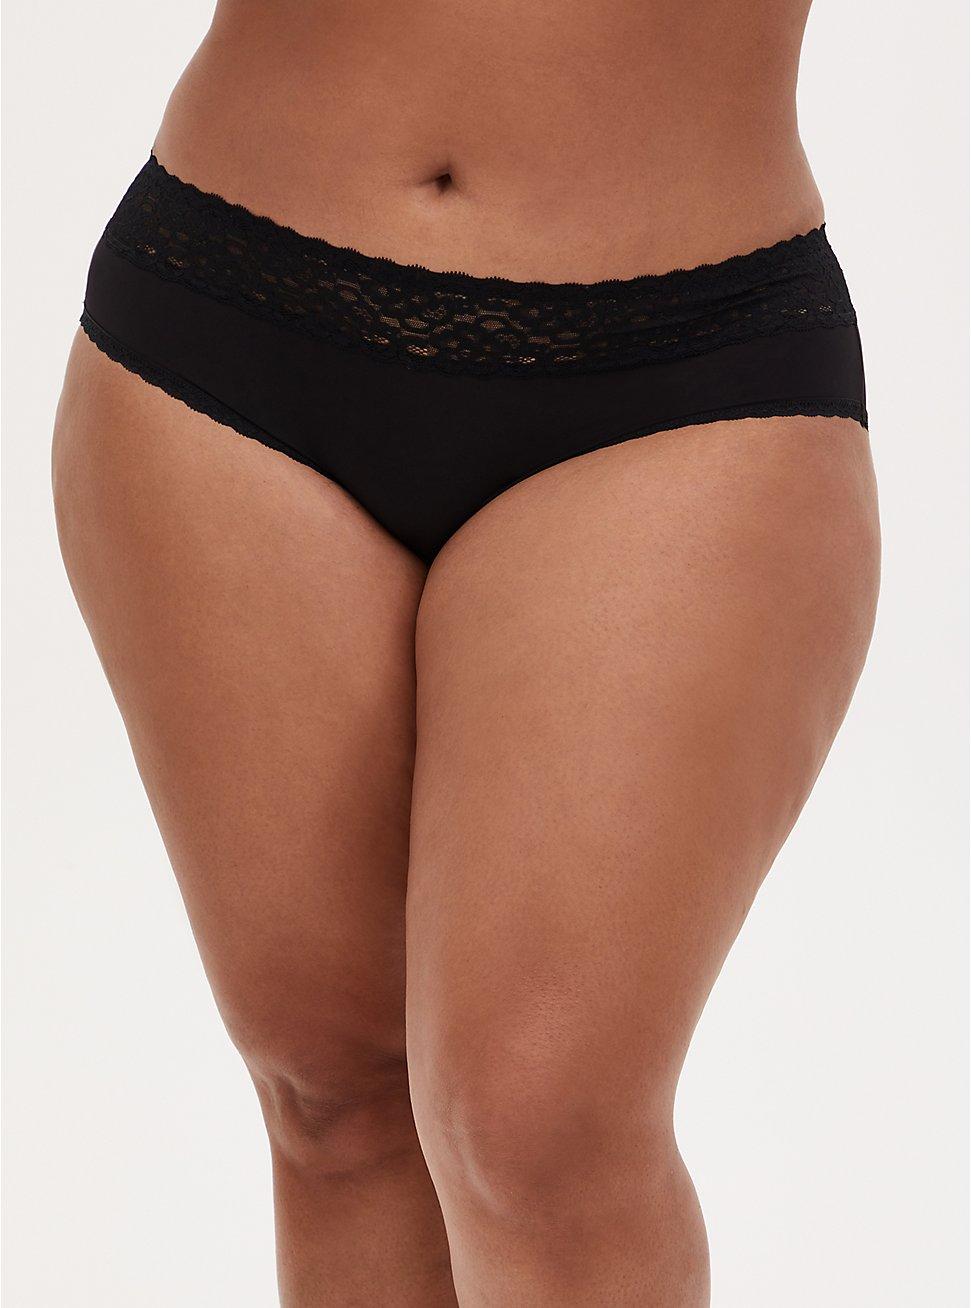 Plus Size Black Wide Lace Shine Hipster Panty , RICH BLACK, hi-res